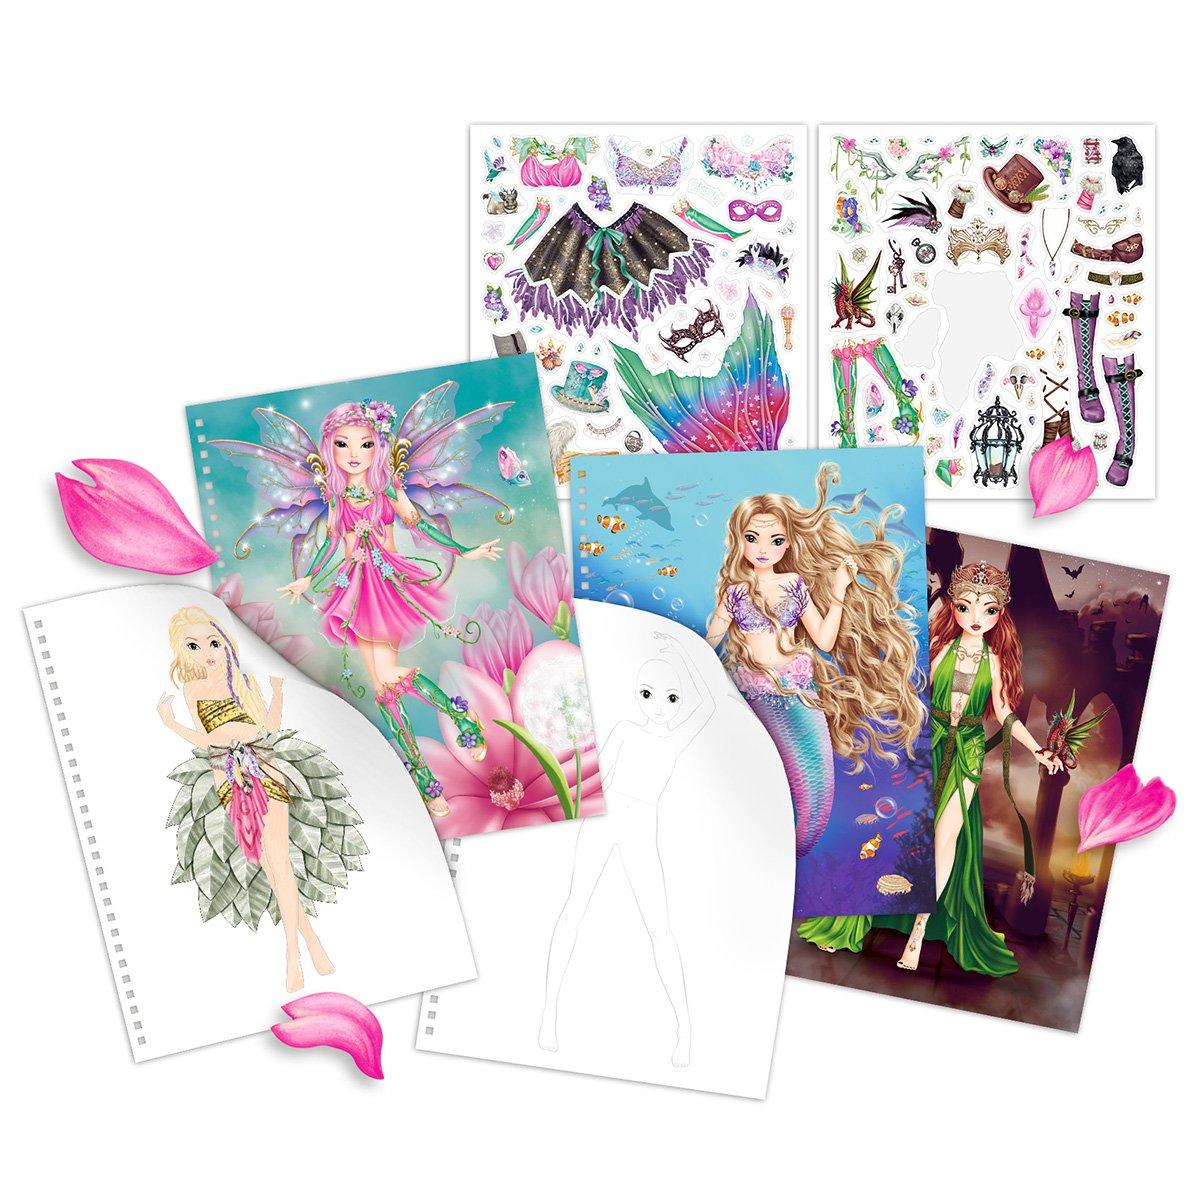 TopModel 3433.001/Fantasy Model Libro para Colorear Cover con Luces LED y Sonido 2/Pliego de Pegatinas 80/innenseiten 4/Colores